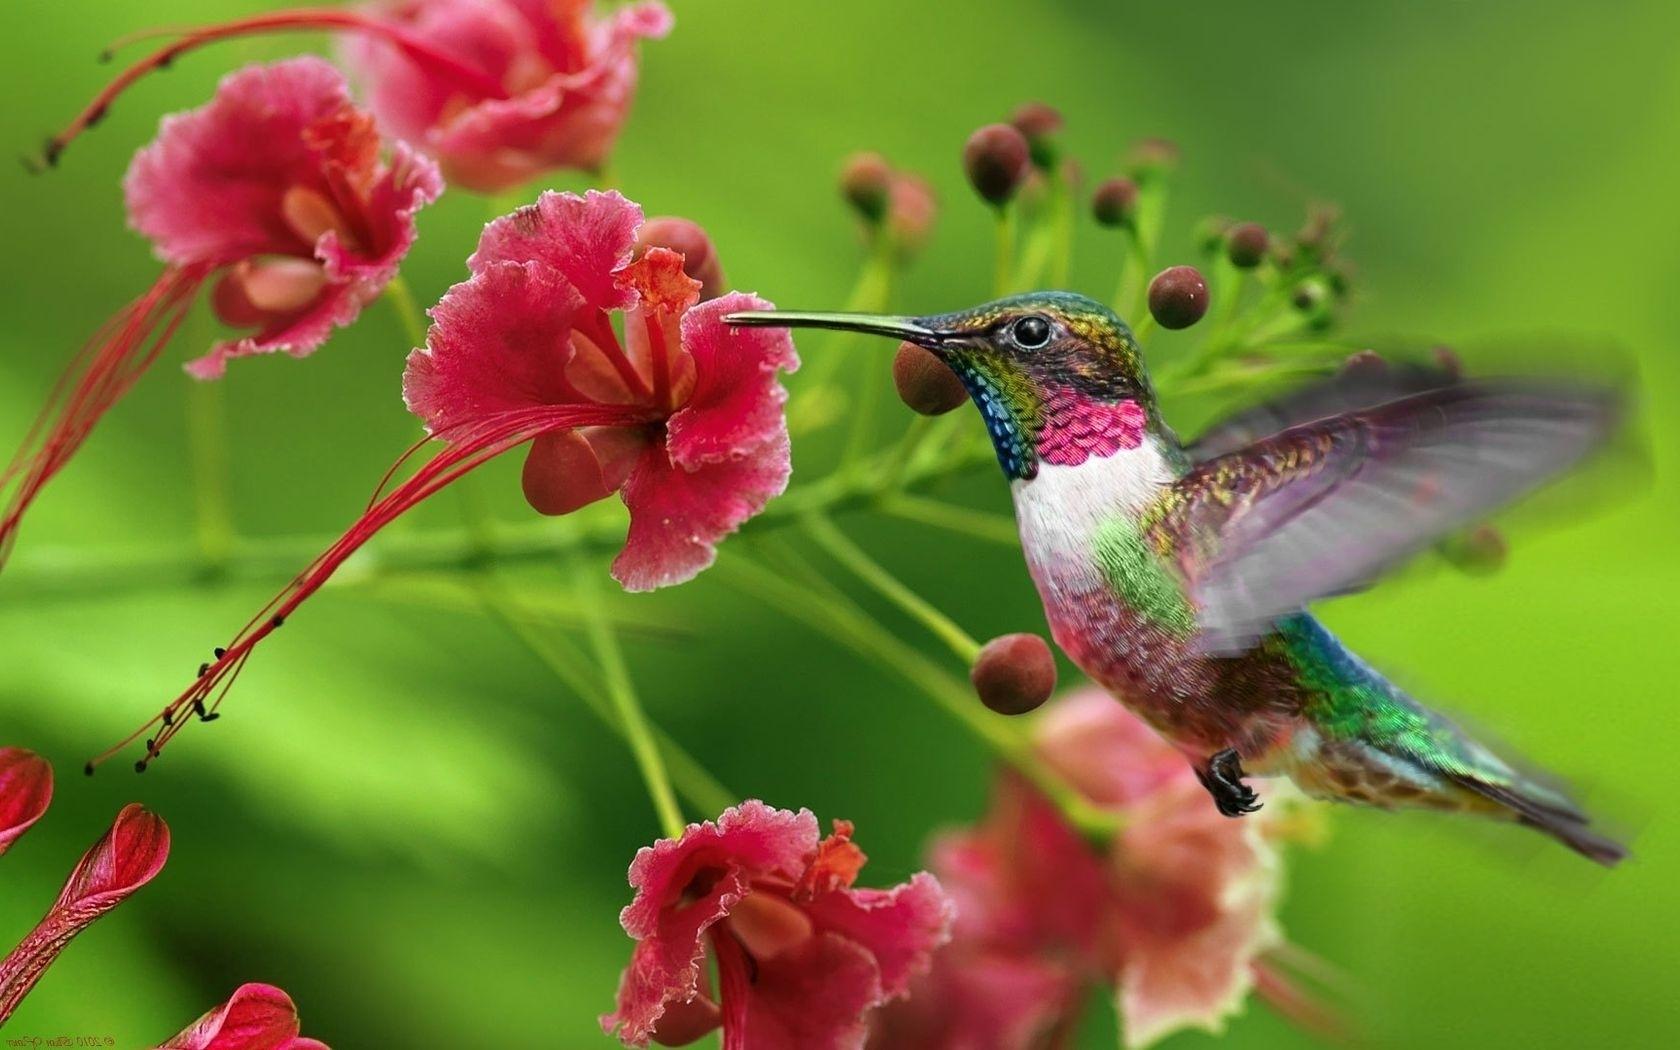 hintergrundbilder  ast swing kolibri blume pflanze